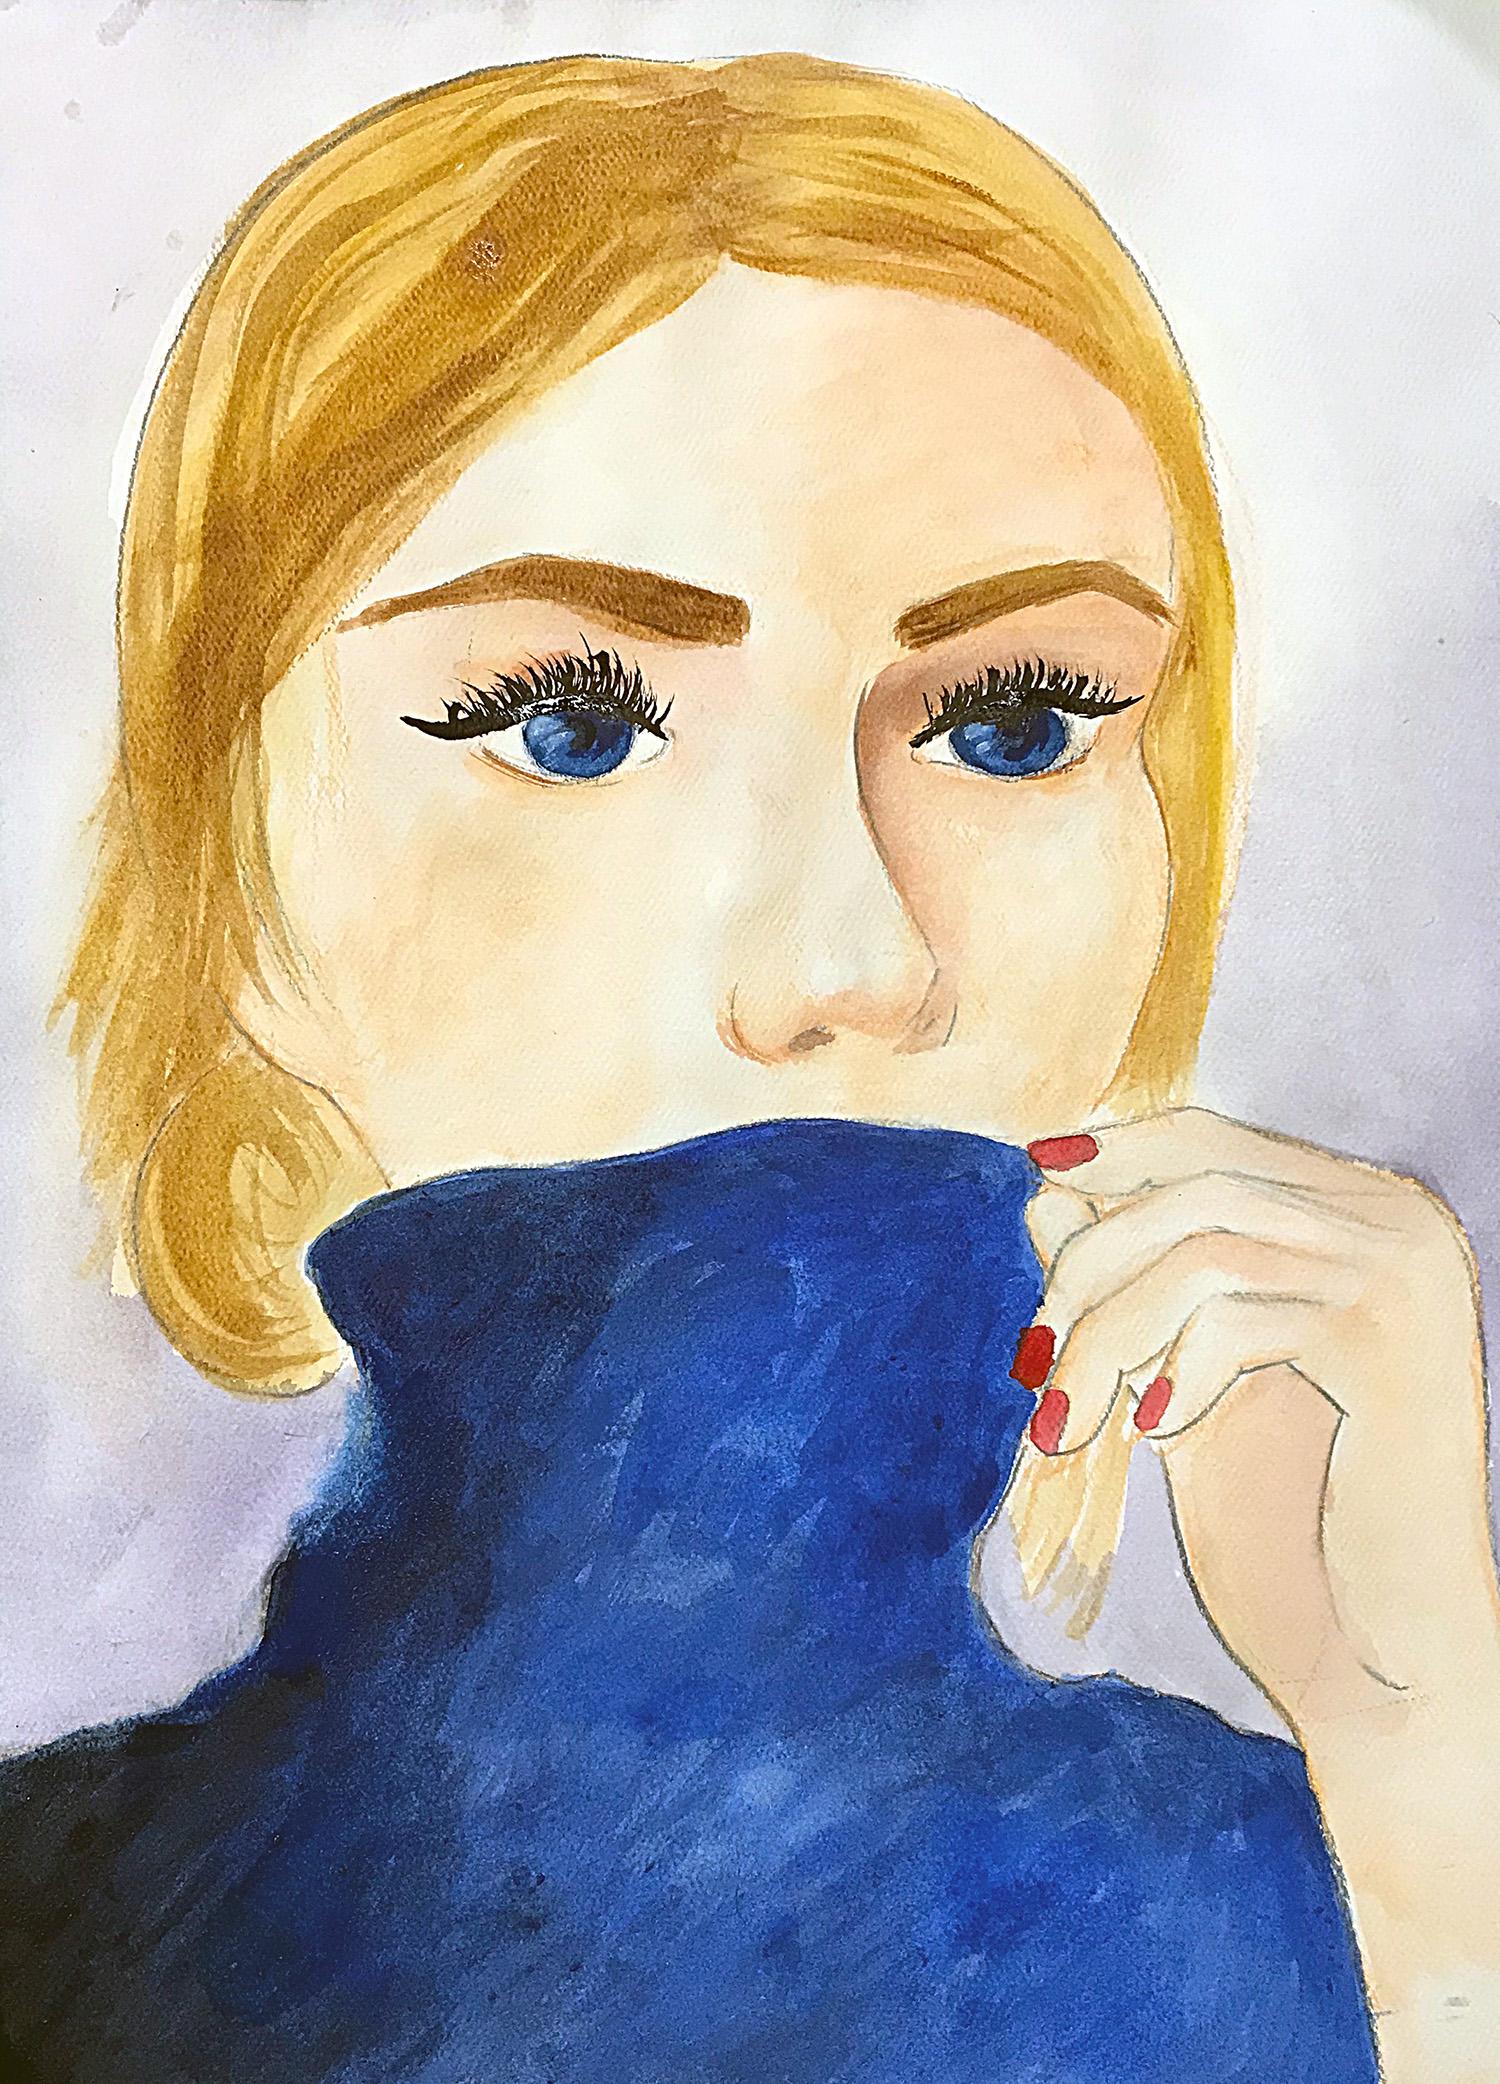 Portrait, watercolors by Irina